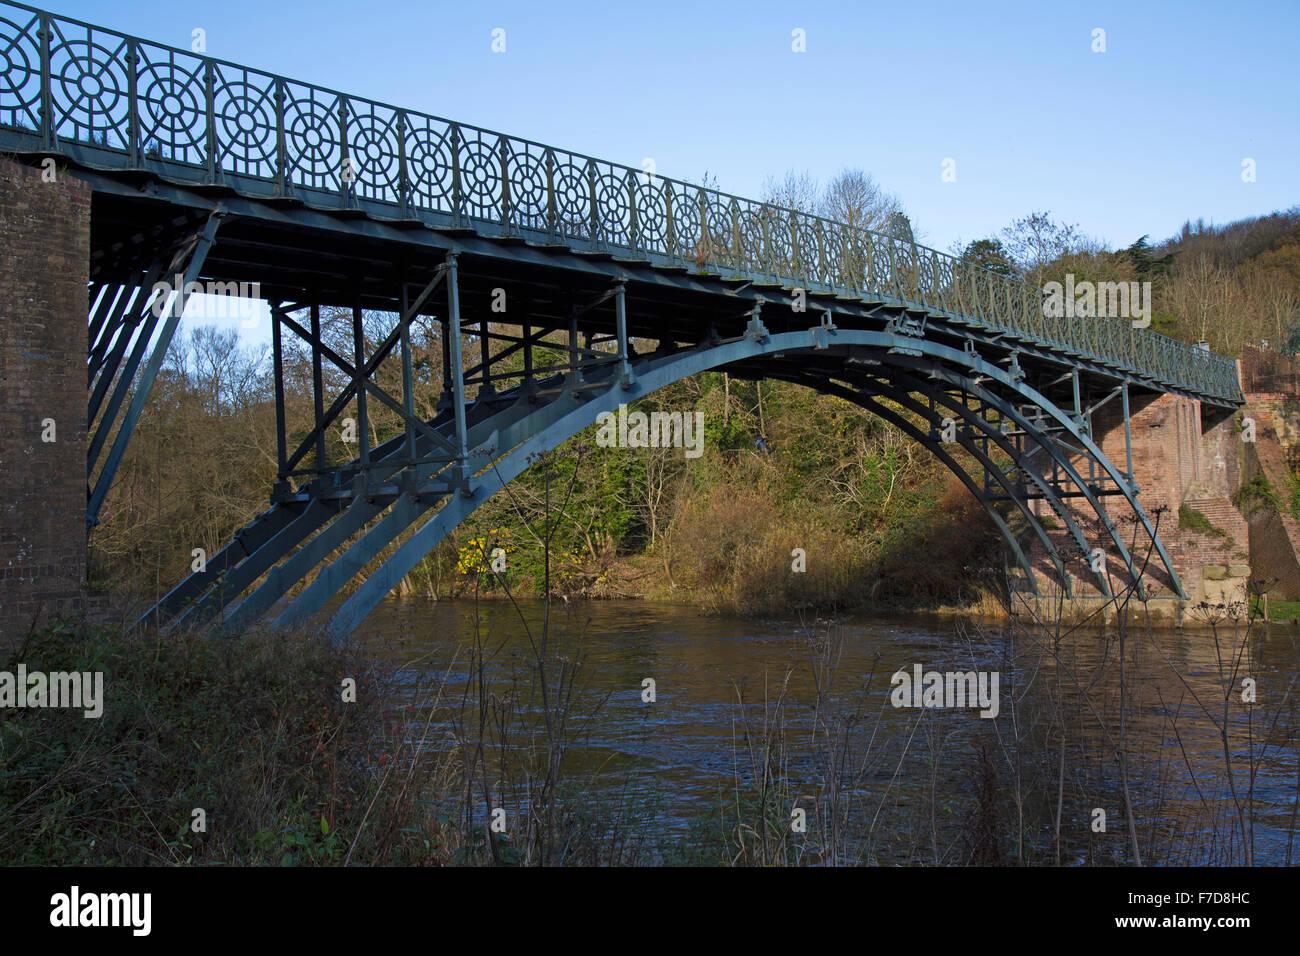 The Coalport Bridge, over the River Severn, in Shropshire, England. The bridge dates from 1818, the original built - Stock Image